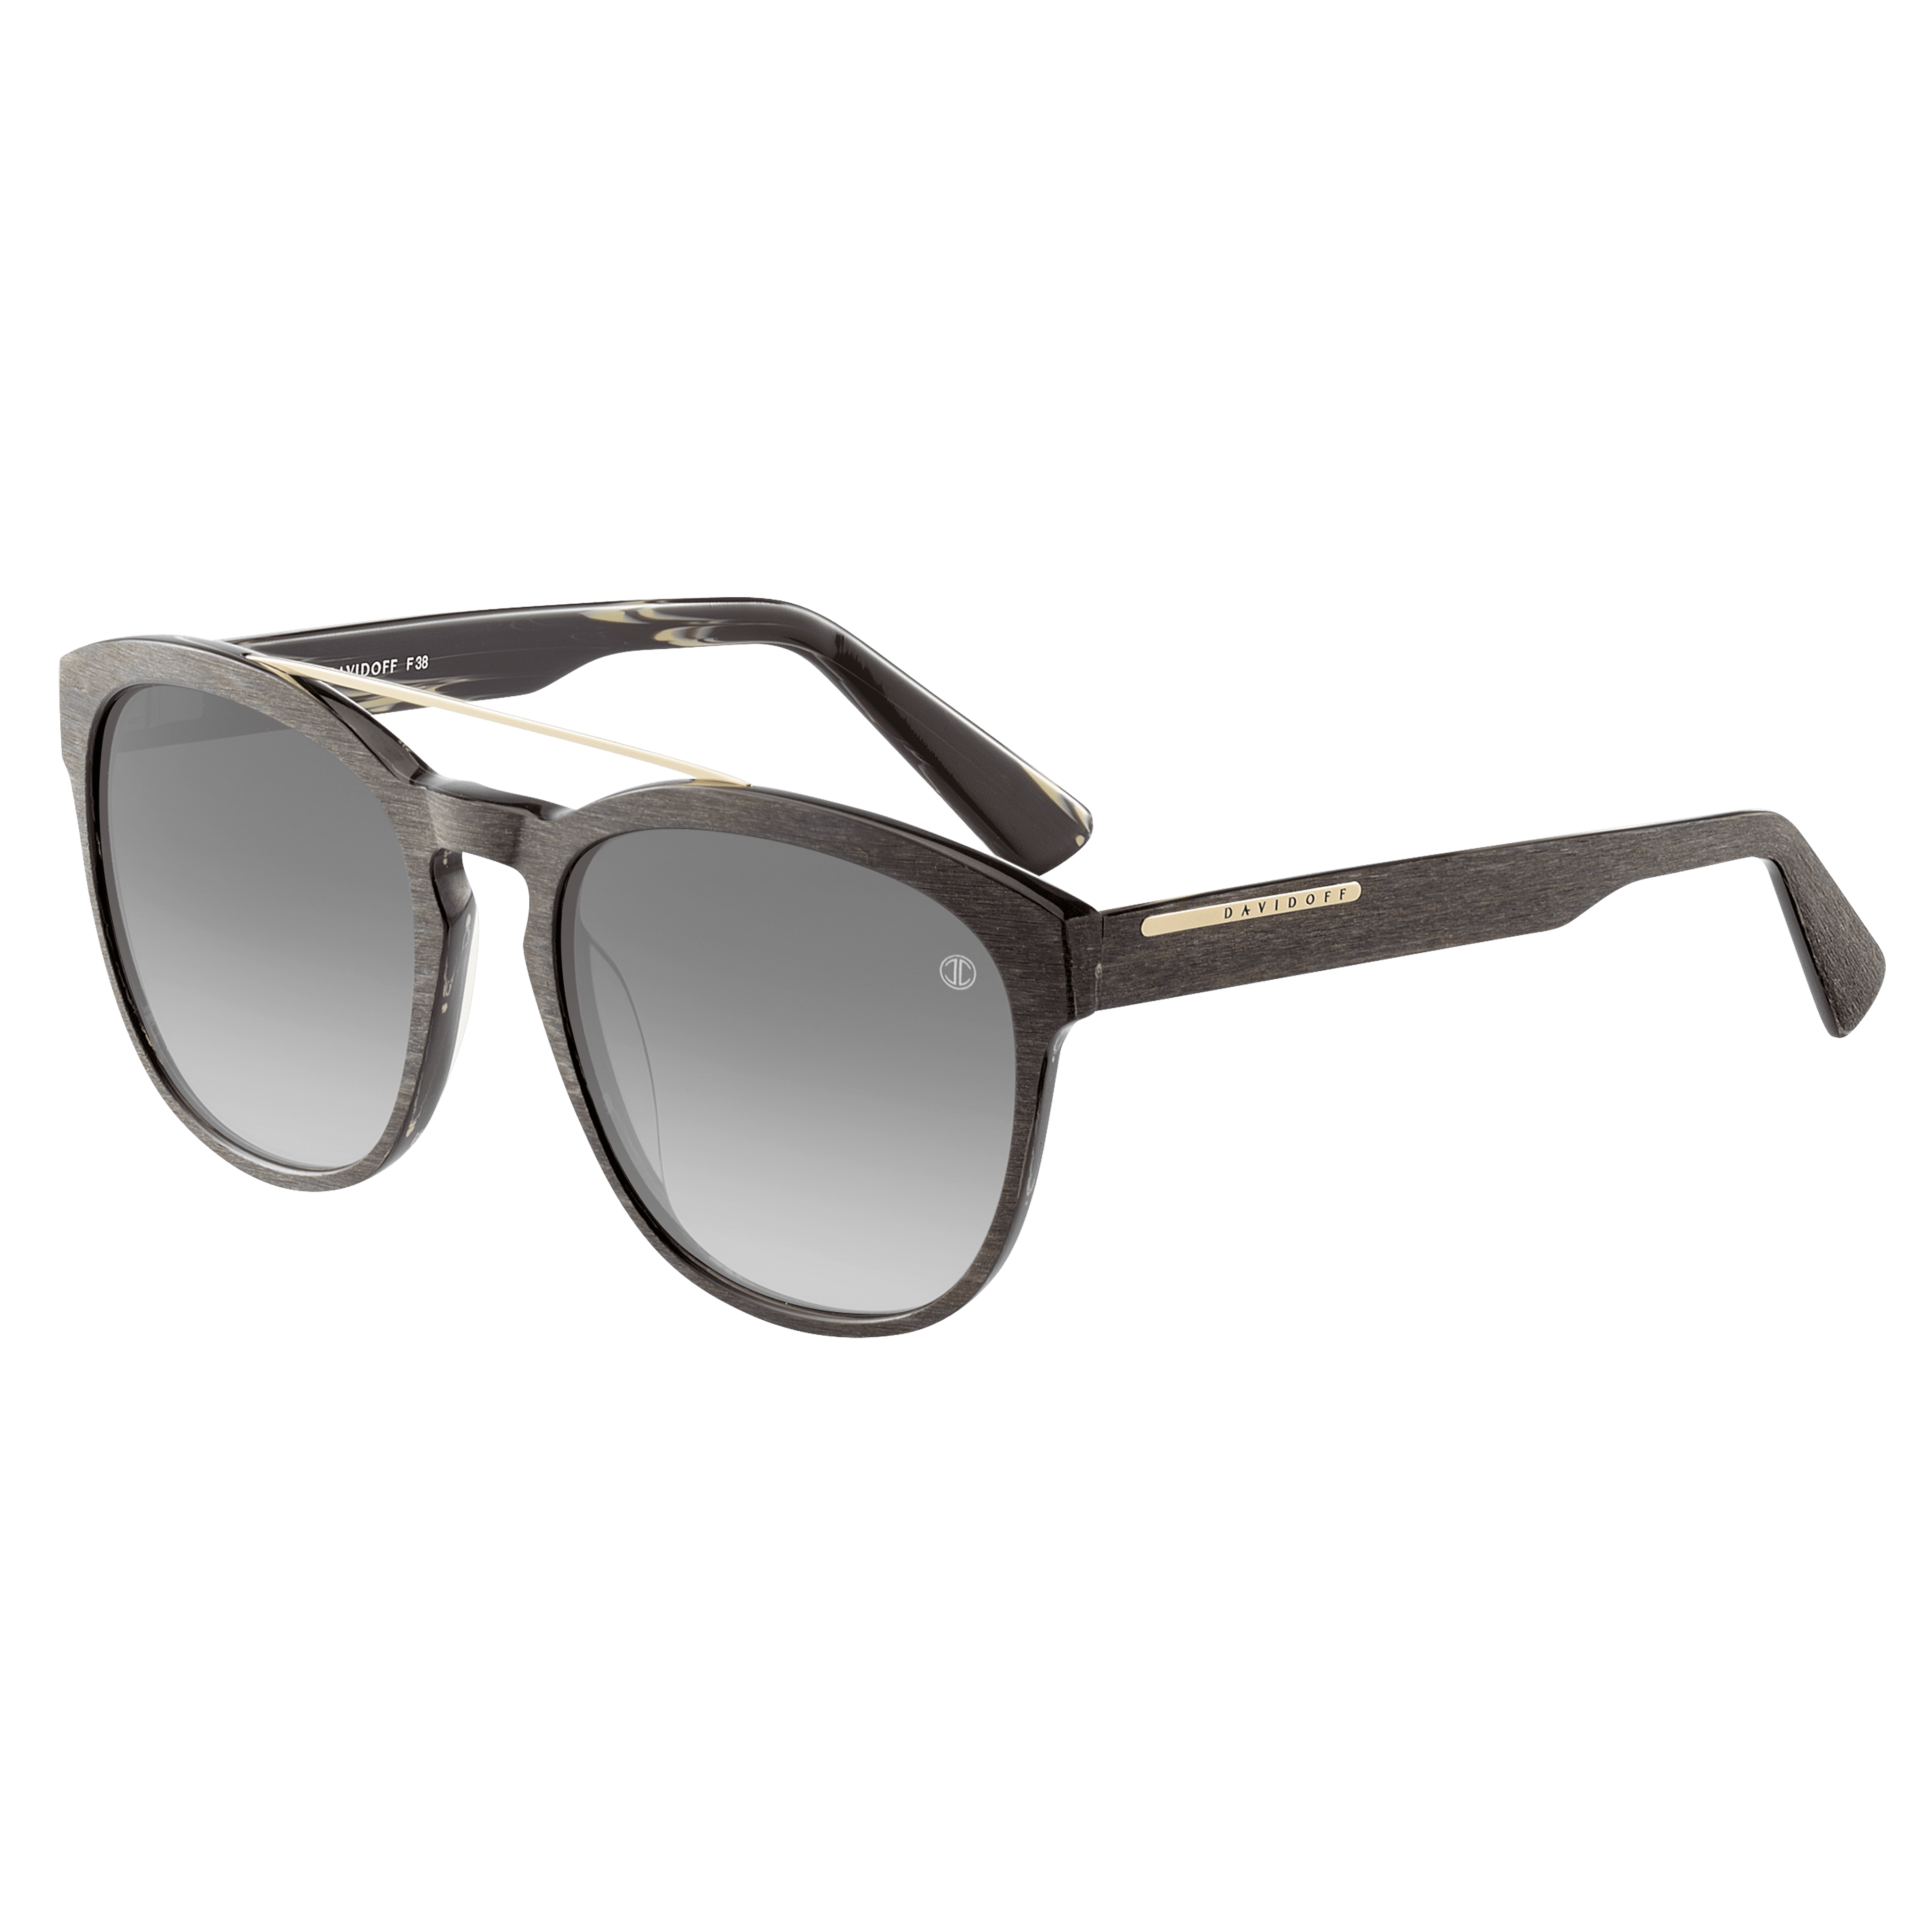 Favorite Style – Sunglasses Mod. 97142 color ref. 6471